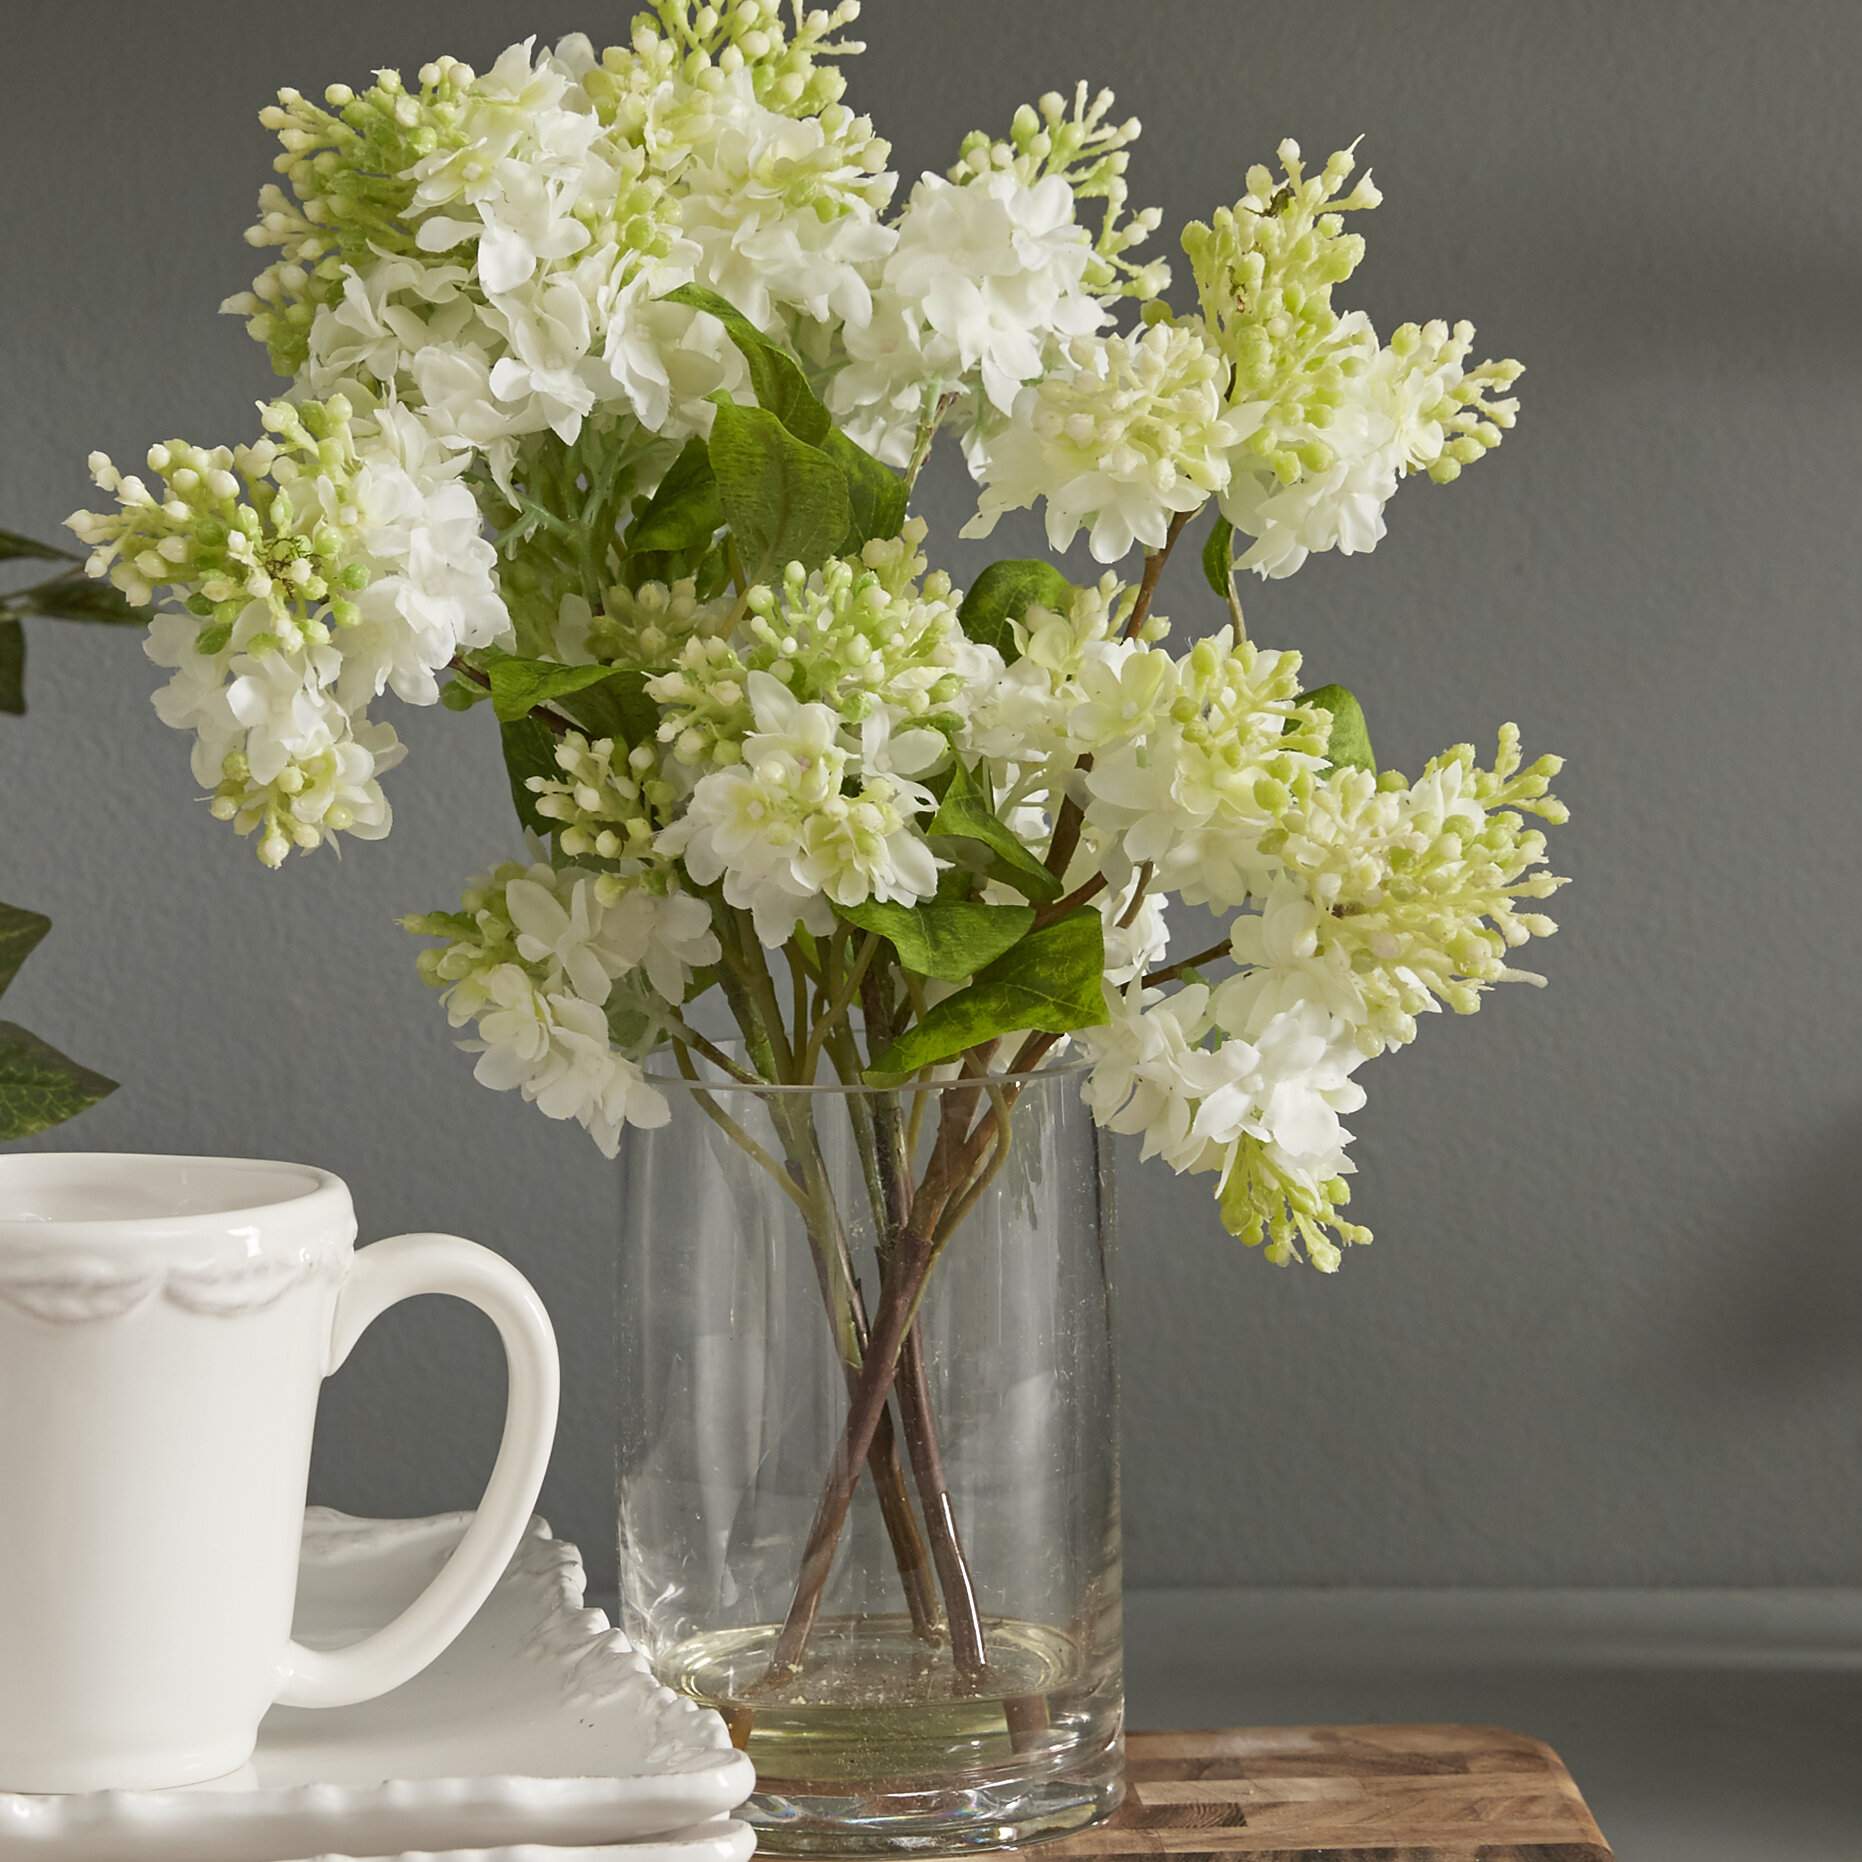 225 & Quincy Lilac Silk Flower Arrangement in Vase